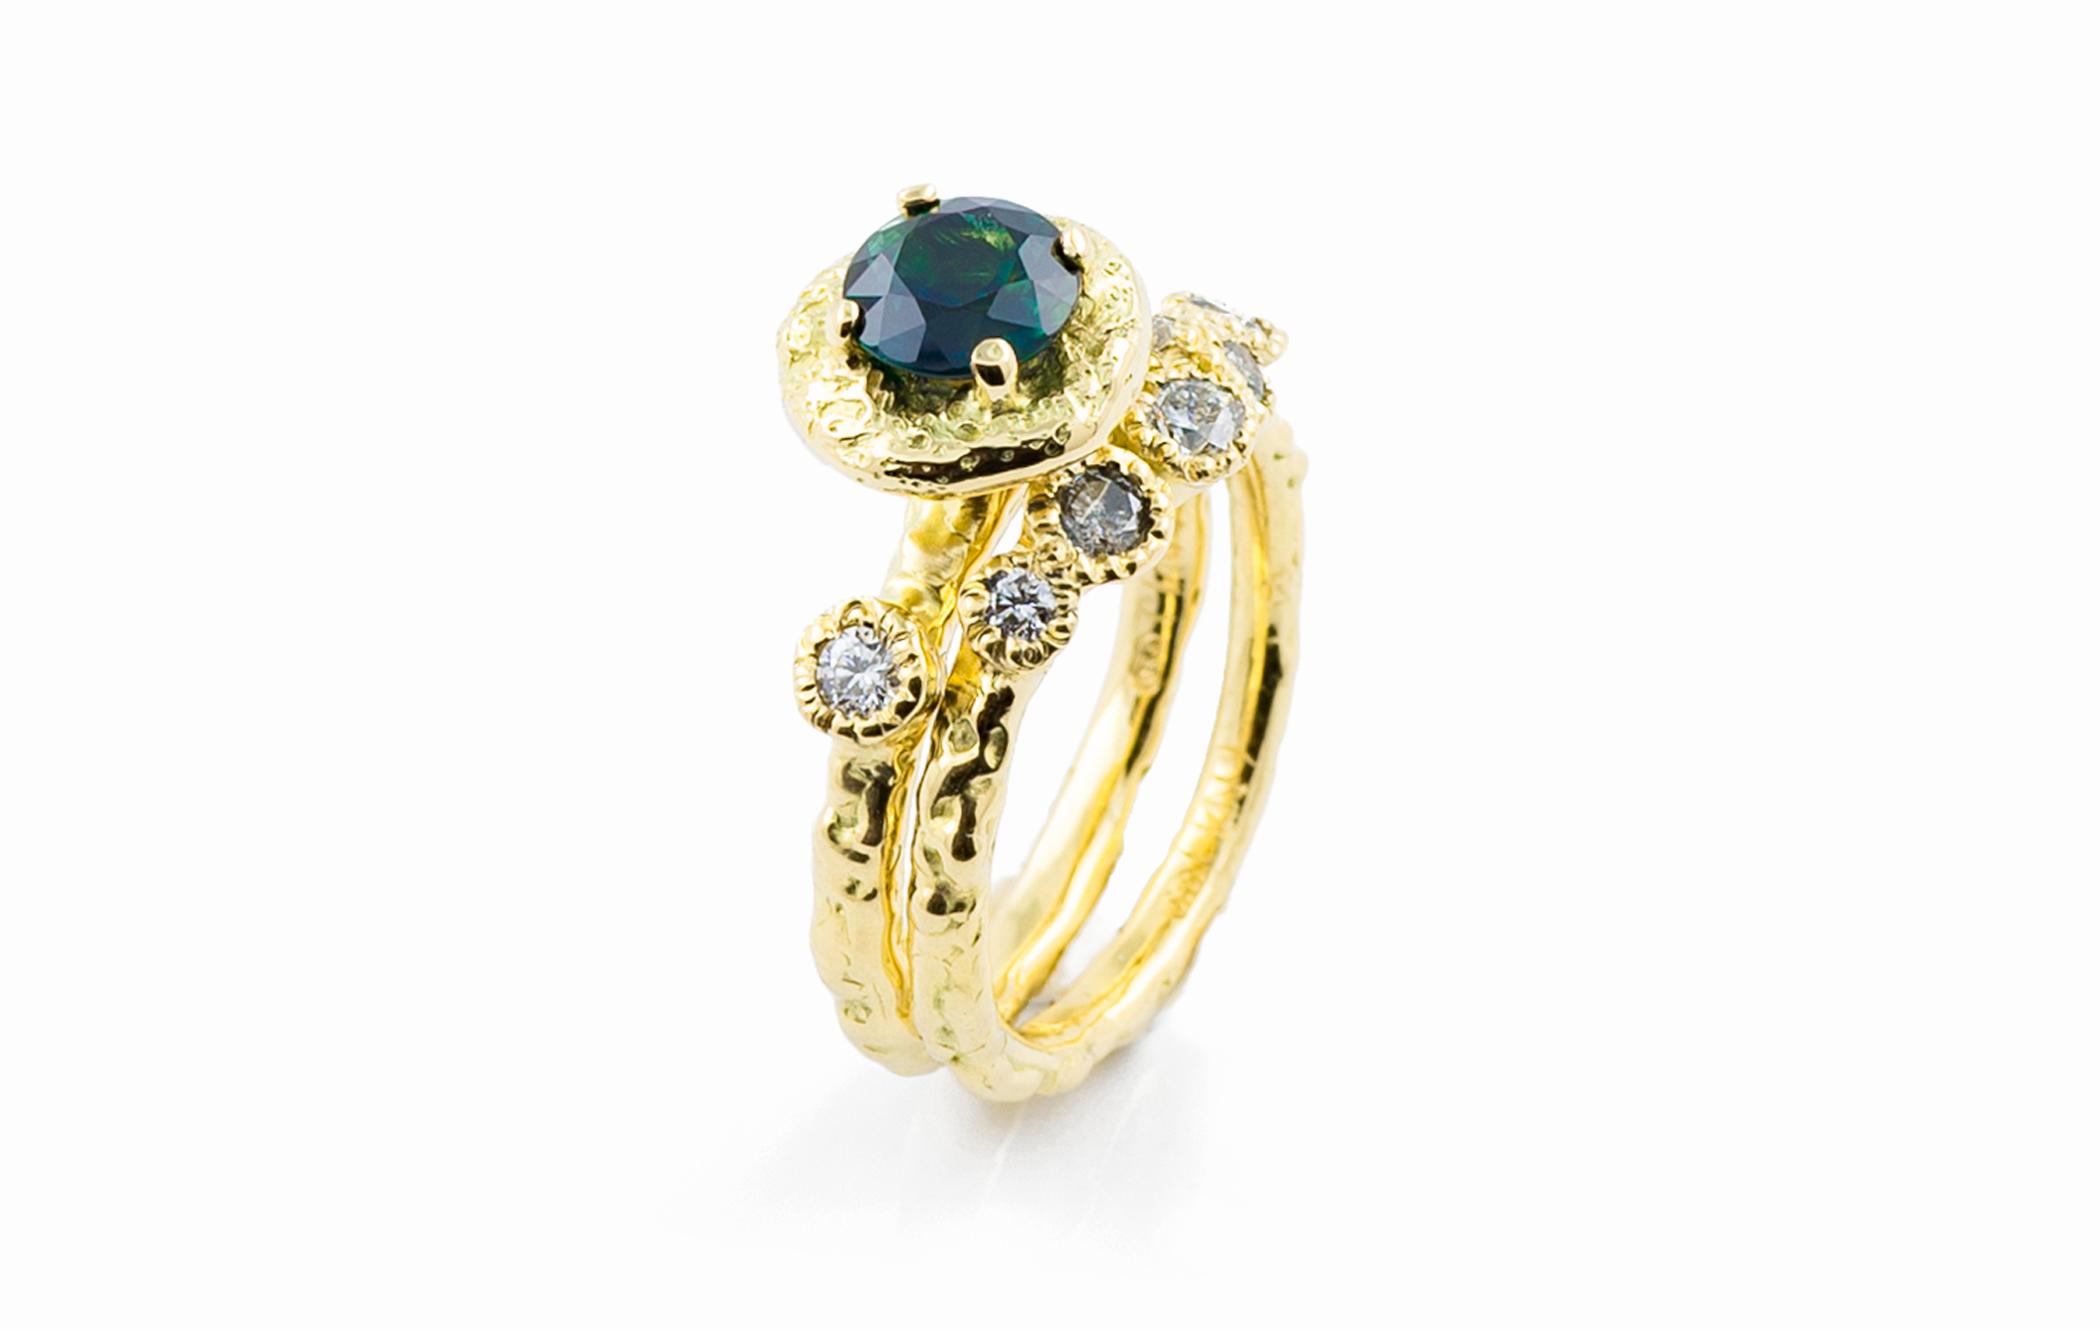 Surfacing Wedding and Engagement Ring   18ct yellow gold, Australian sapphire, salt and pepper diamonds, white diamonds.